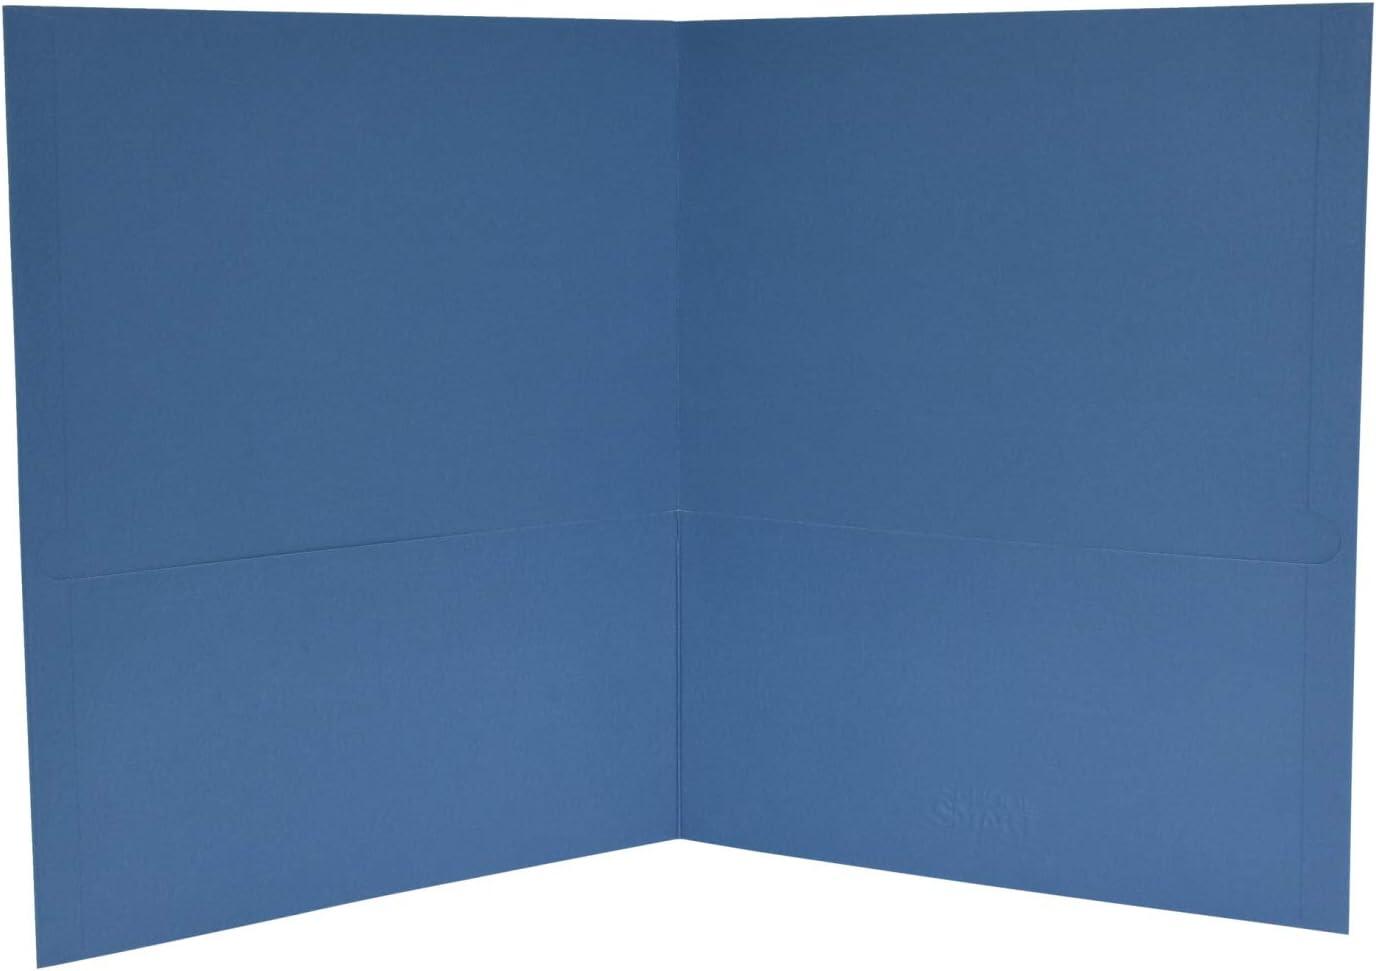 School Smart 2-Pocket Folders Pack of 25 Light Blue